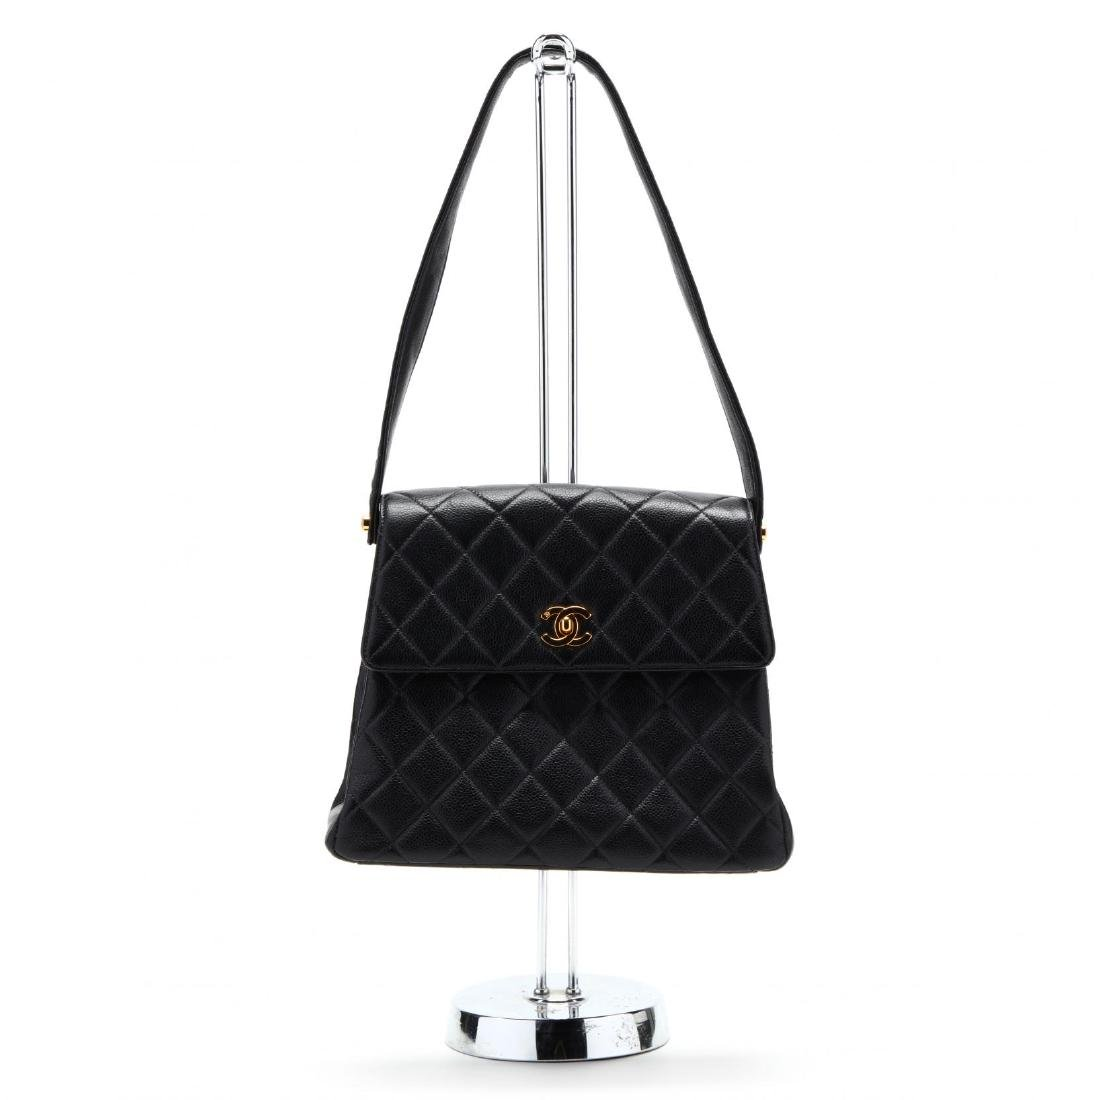 Caviar Leather Trapeze Flap Handbag, Chanel - 5